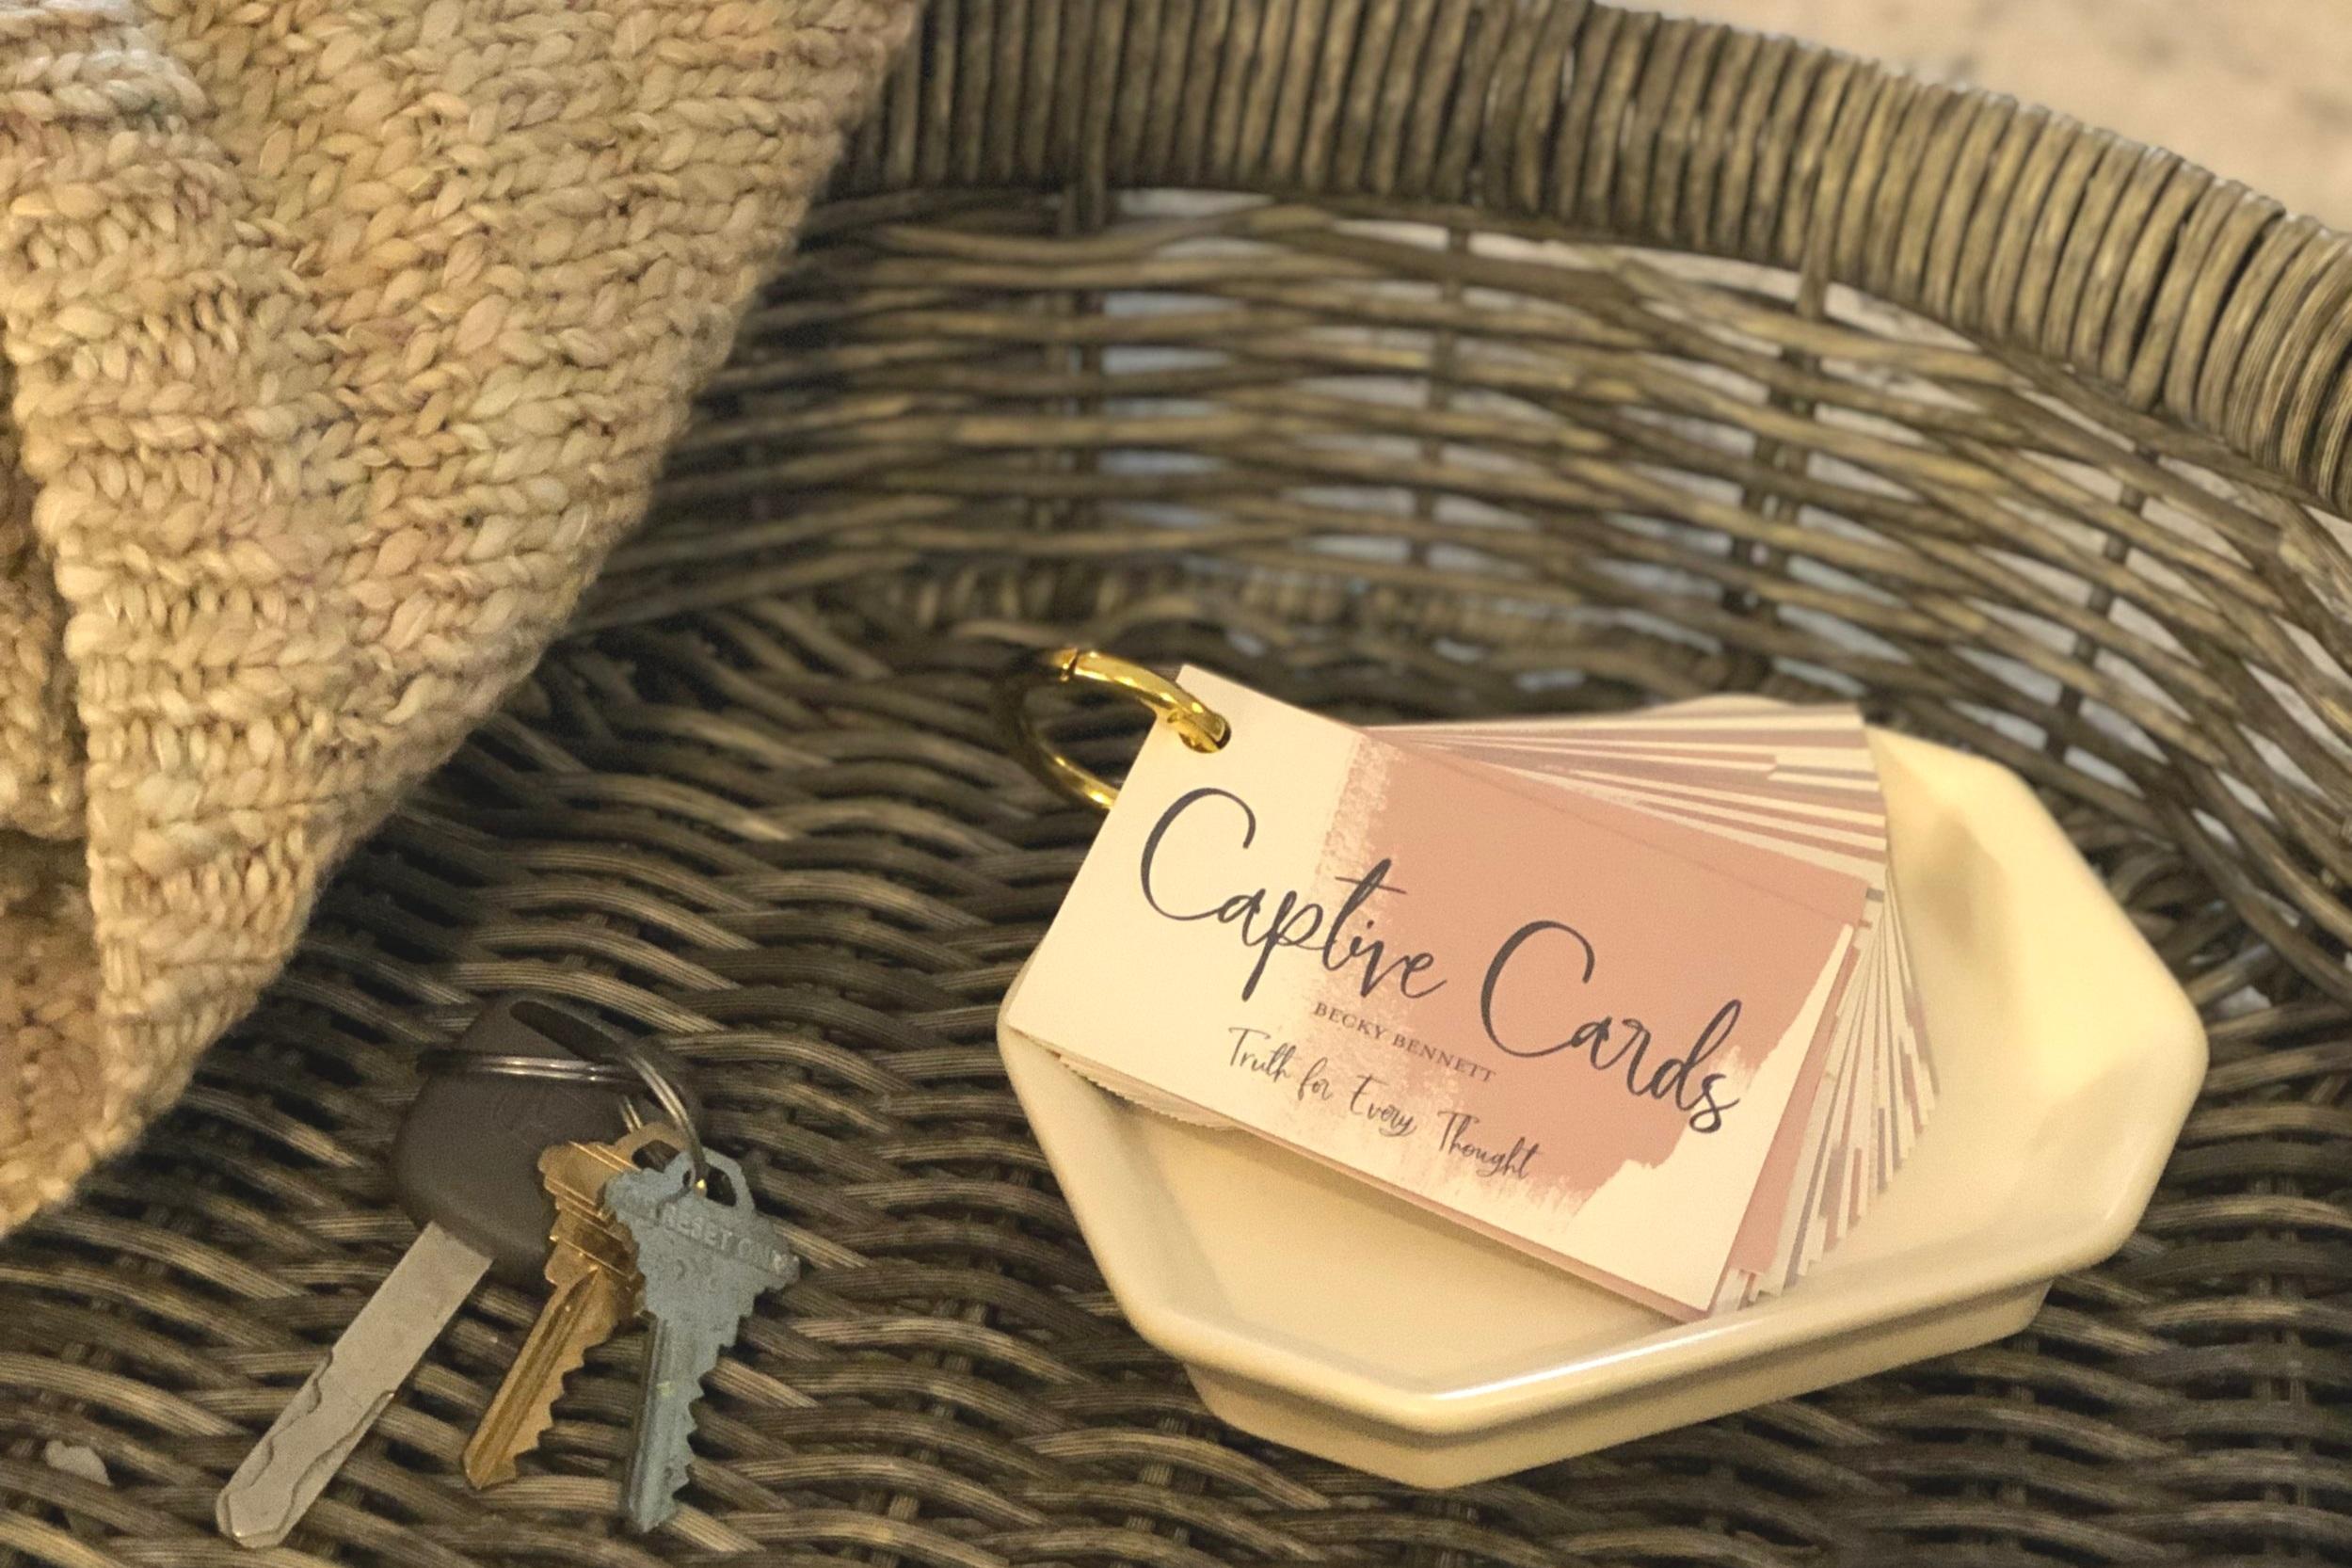 2019+Captive+Cards_To+Choose+Joy+Bible+Study+Scripture+Memory+Cards.jpg